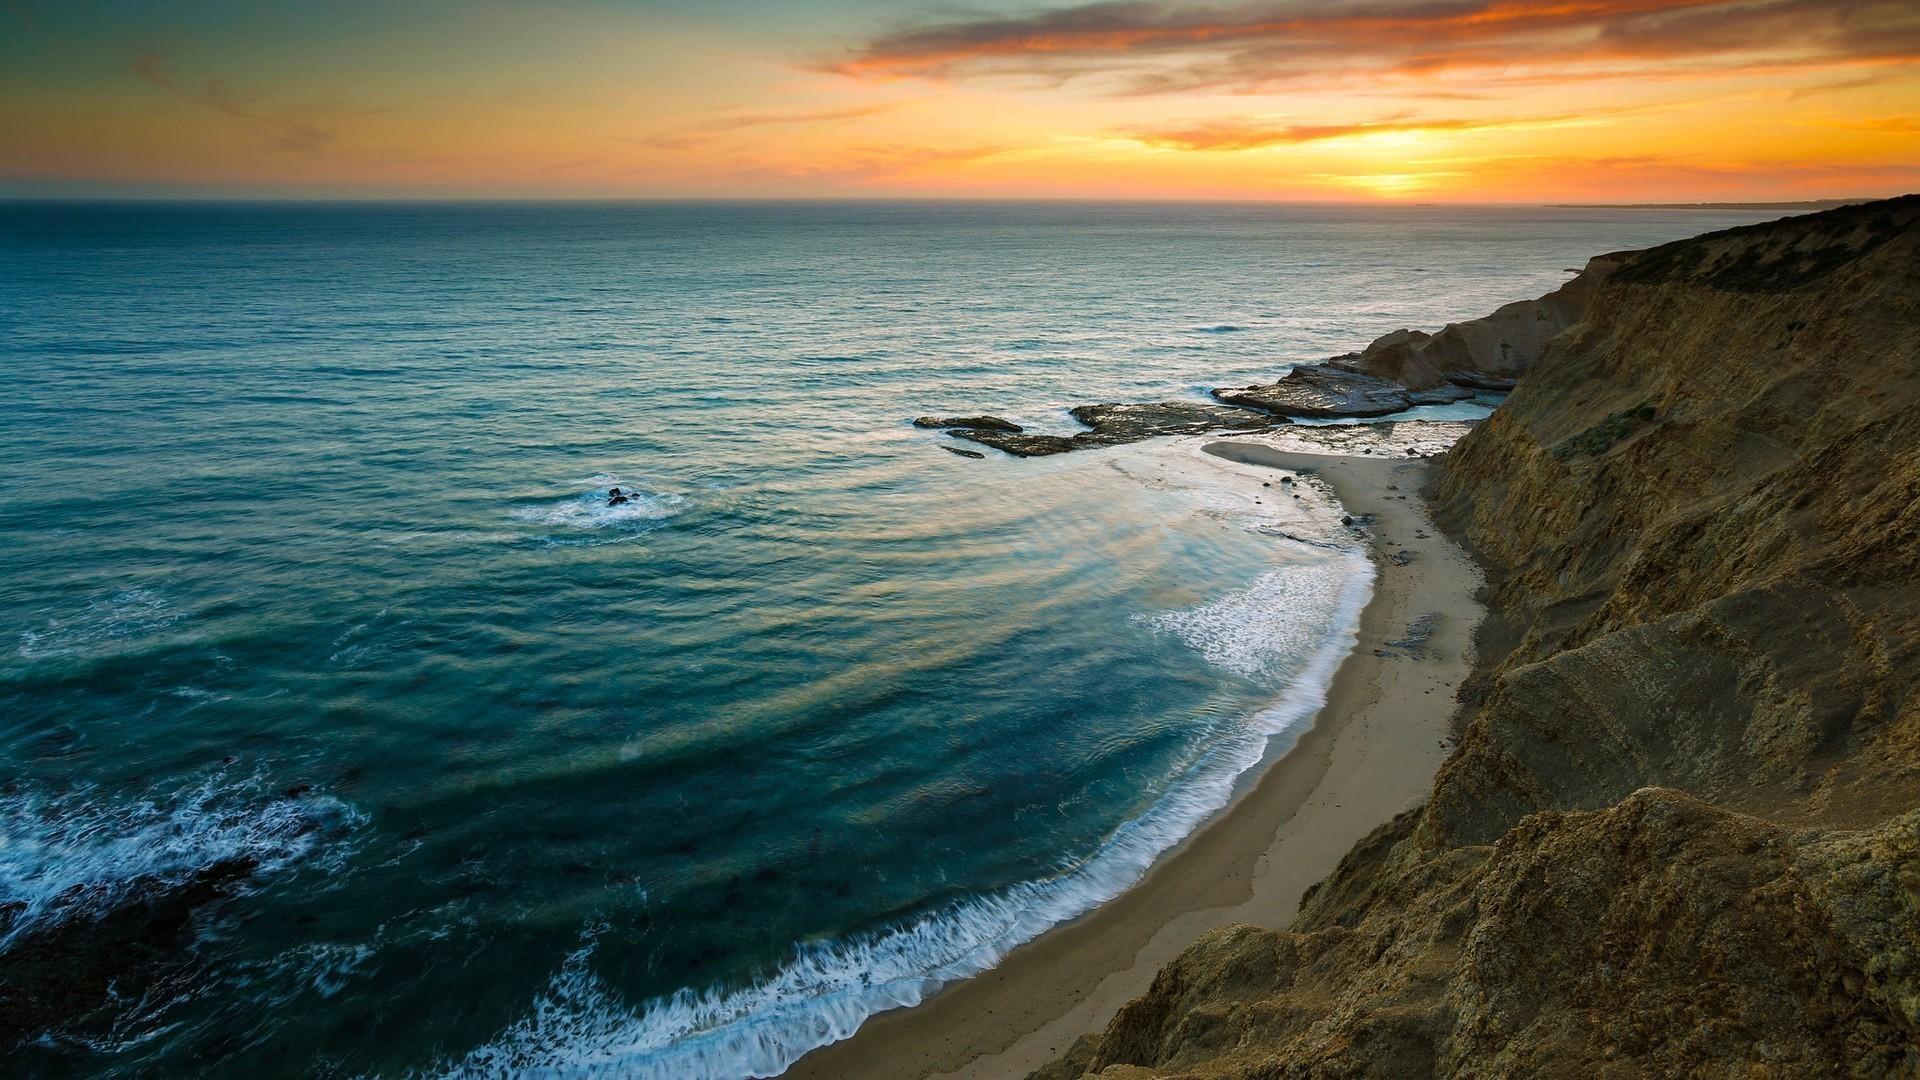 Sunset at the Beach HD Wallpaper. « »